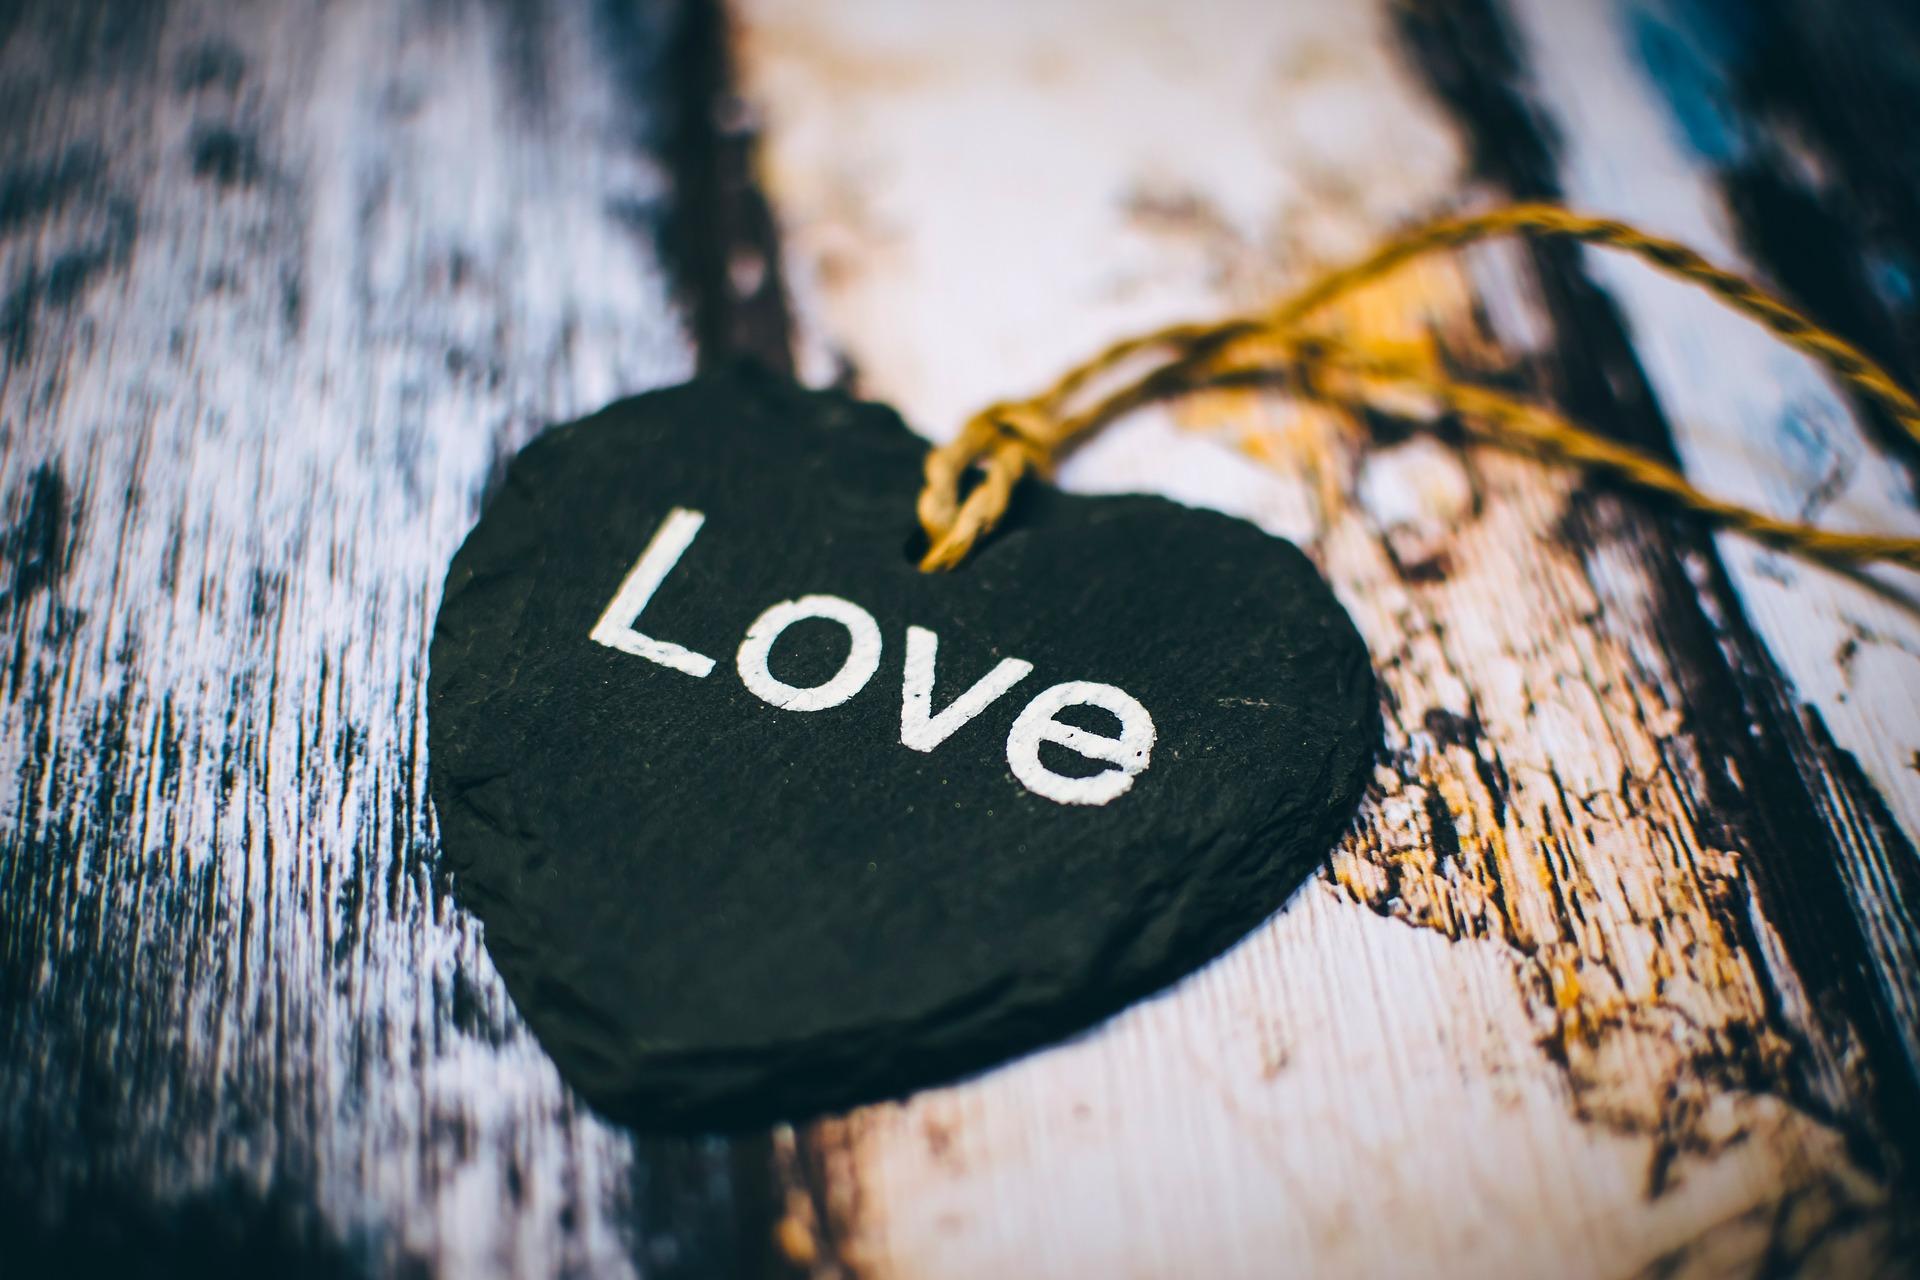 Teleurstelling in de liefde